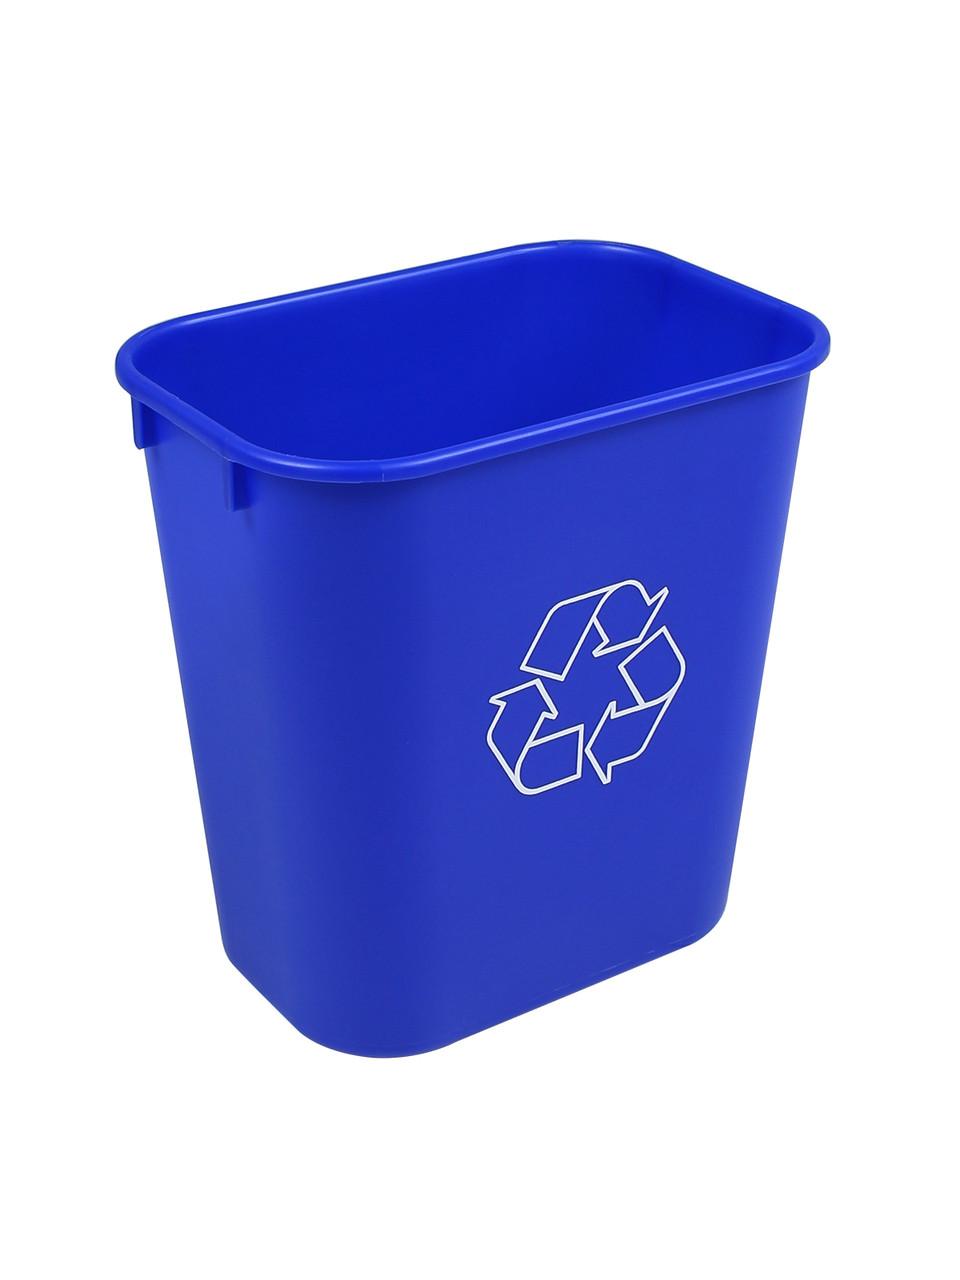 14 Quart Blue Kitchen Recycle Wastebasket 14Q (2 Pack)